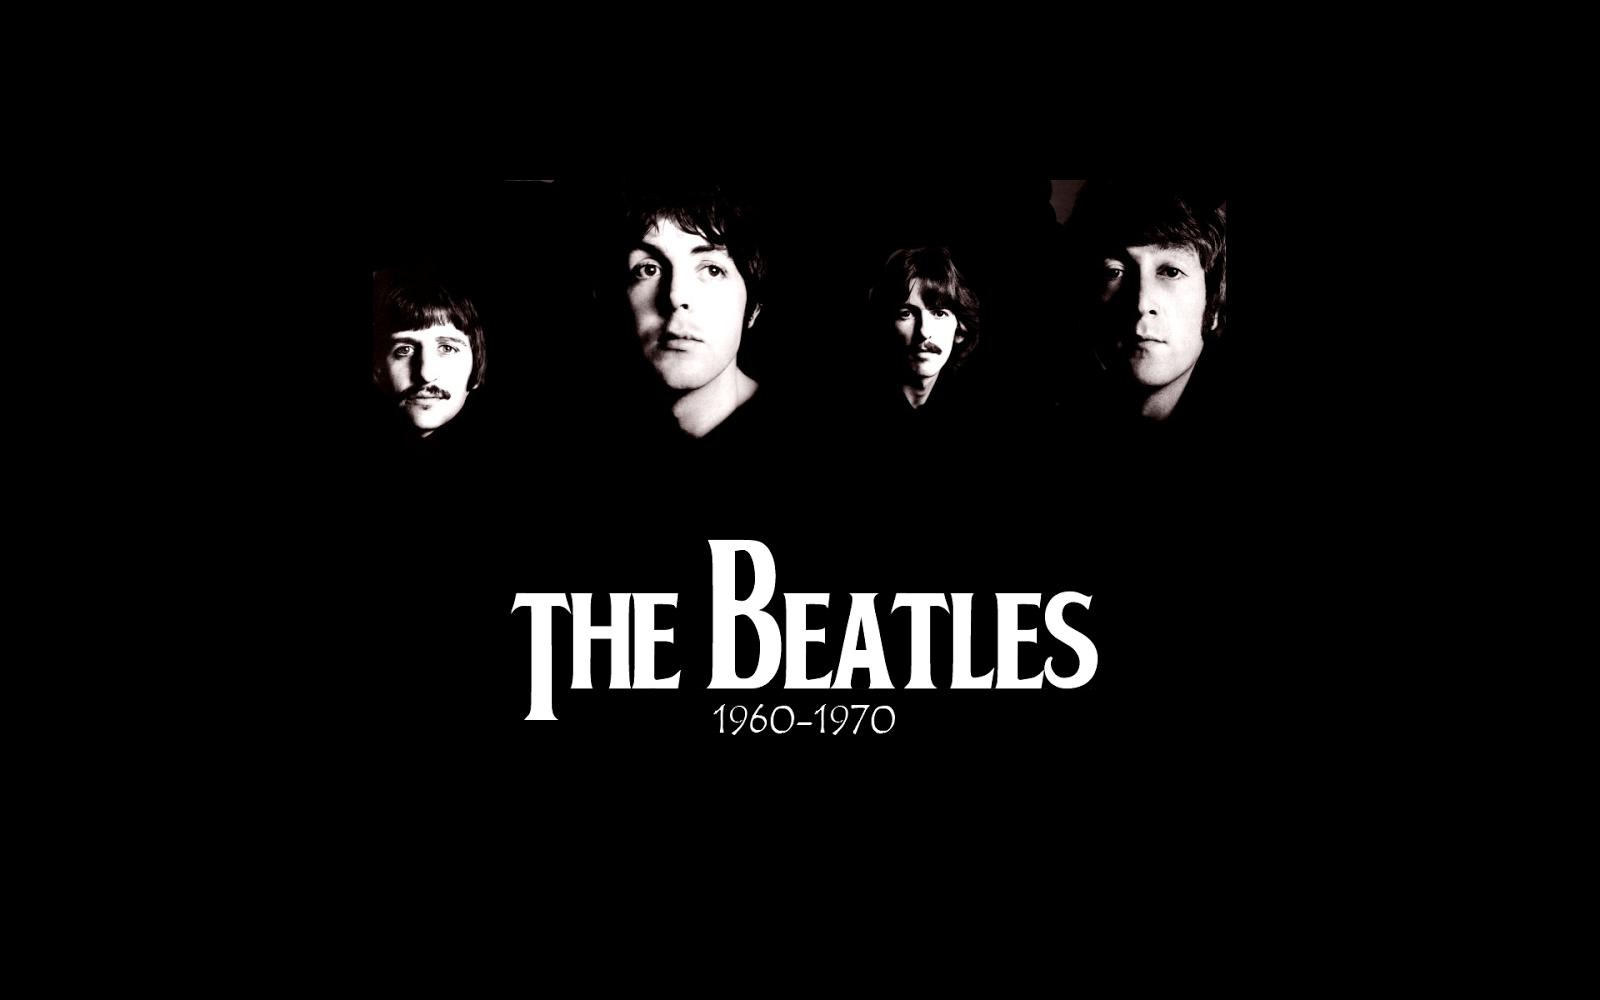 The Beatles Wallpapers - GzsiHai.com